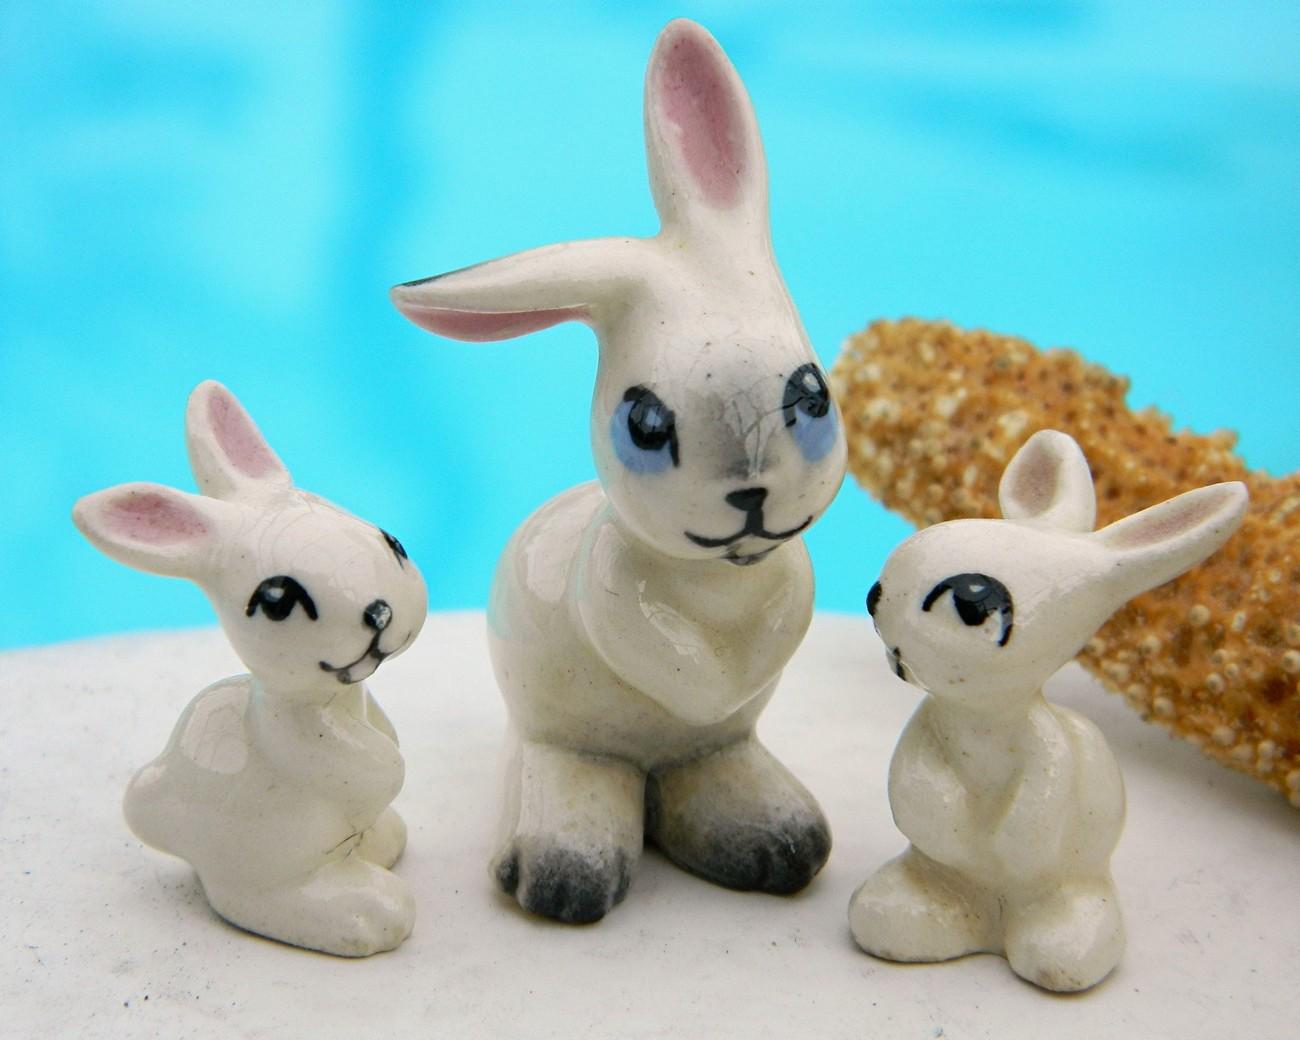 Vintage hagen renaker early miniature rabbits ears apart set of 3